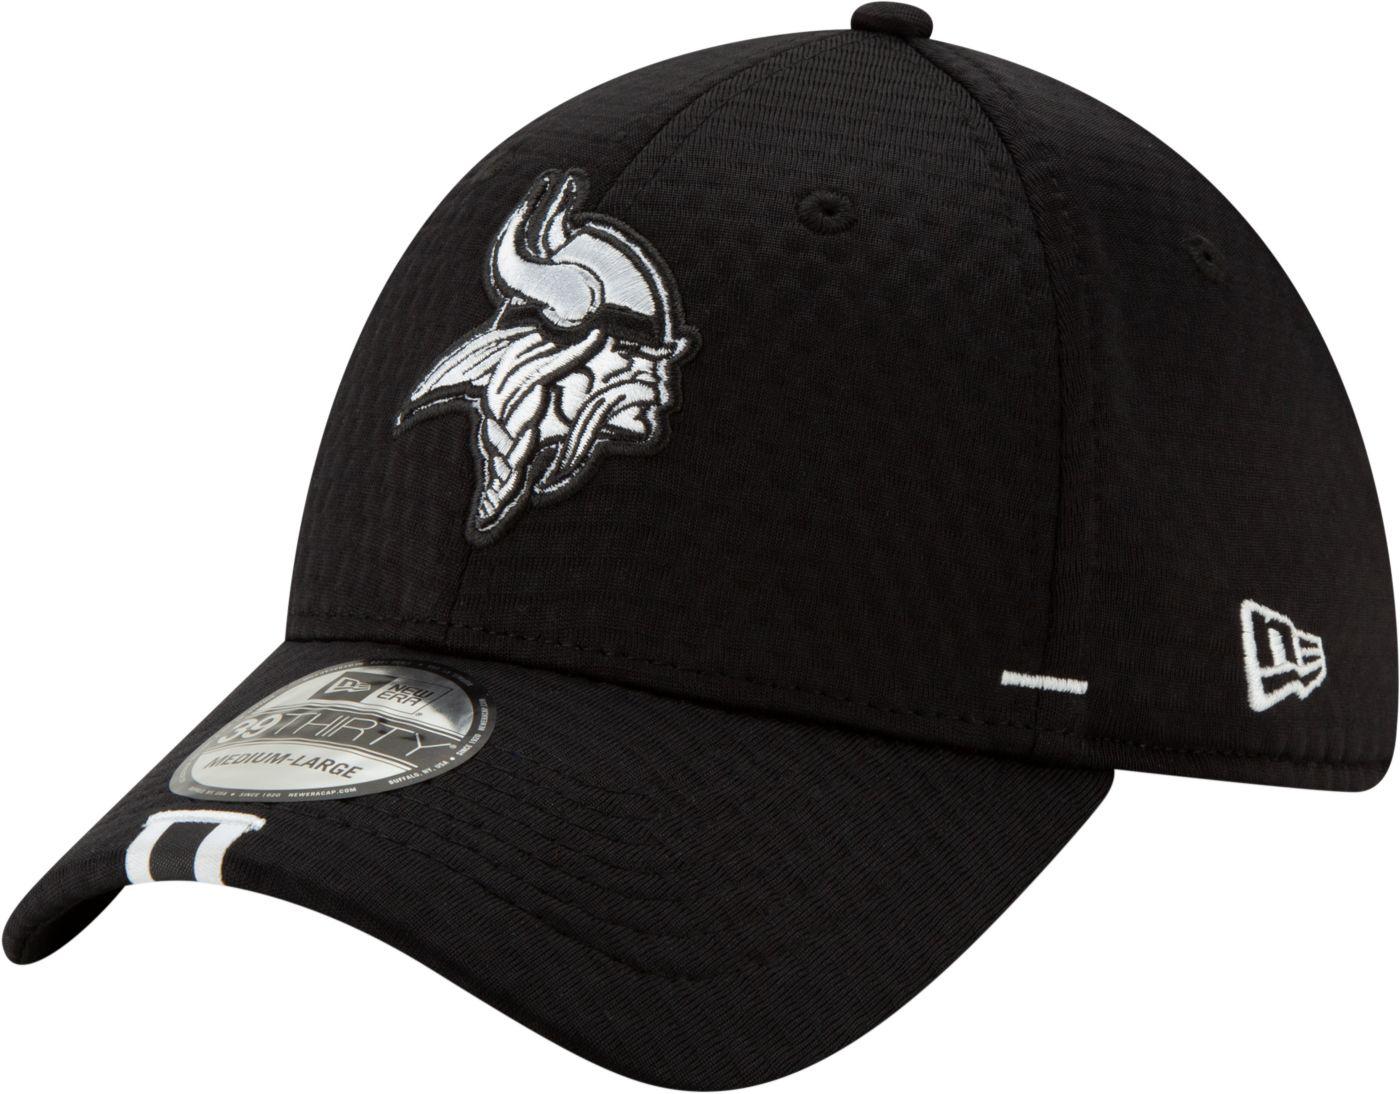 New Era Men's Minnesota Vikings Sideline Training Camp 39Thirty Stretch Fit Black Hat